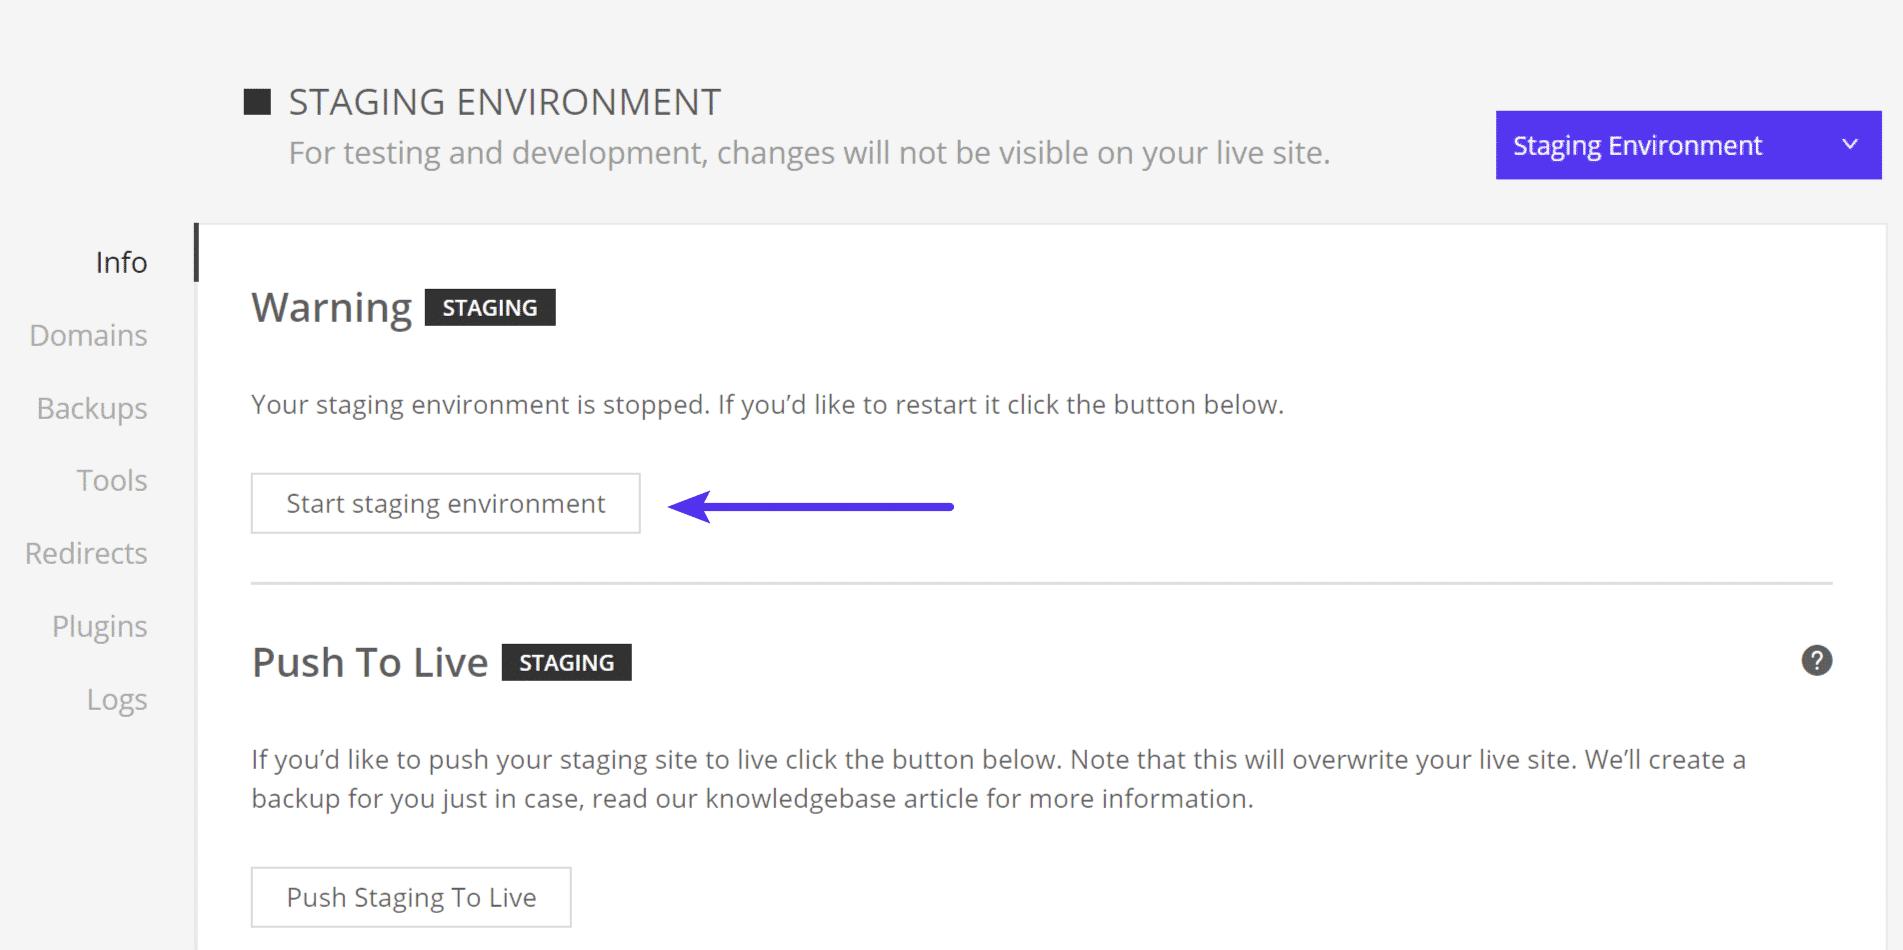 Start staging environment